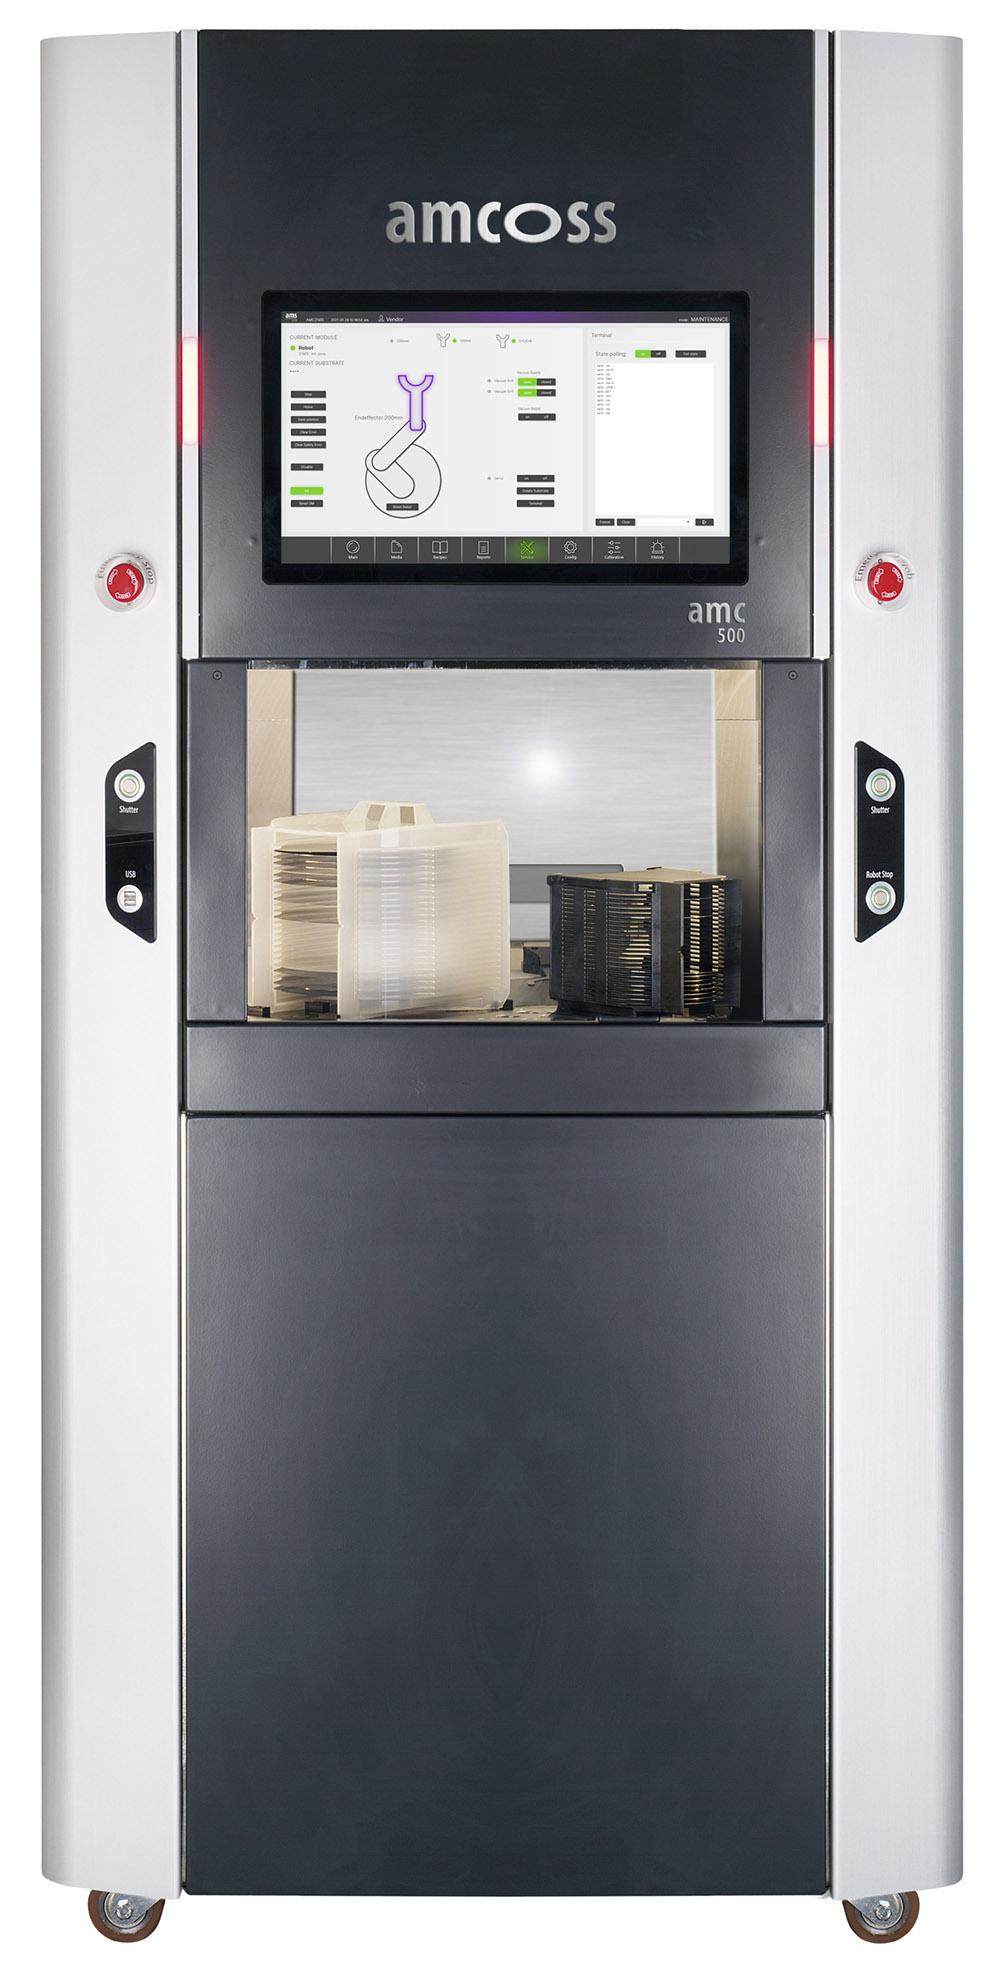 amcoss amc 500 single wafer wet processor